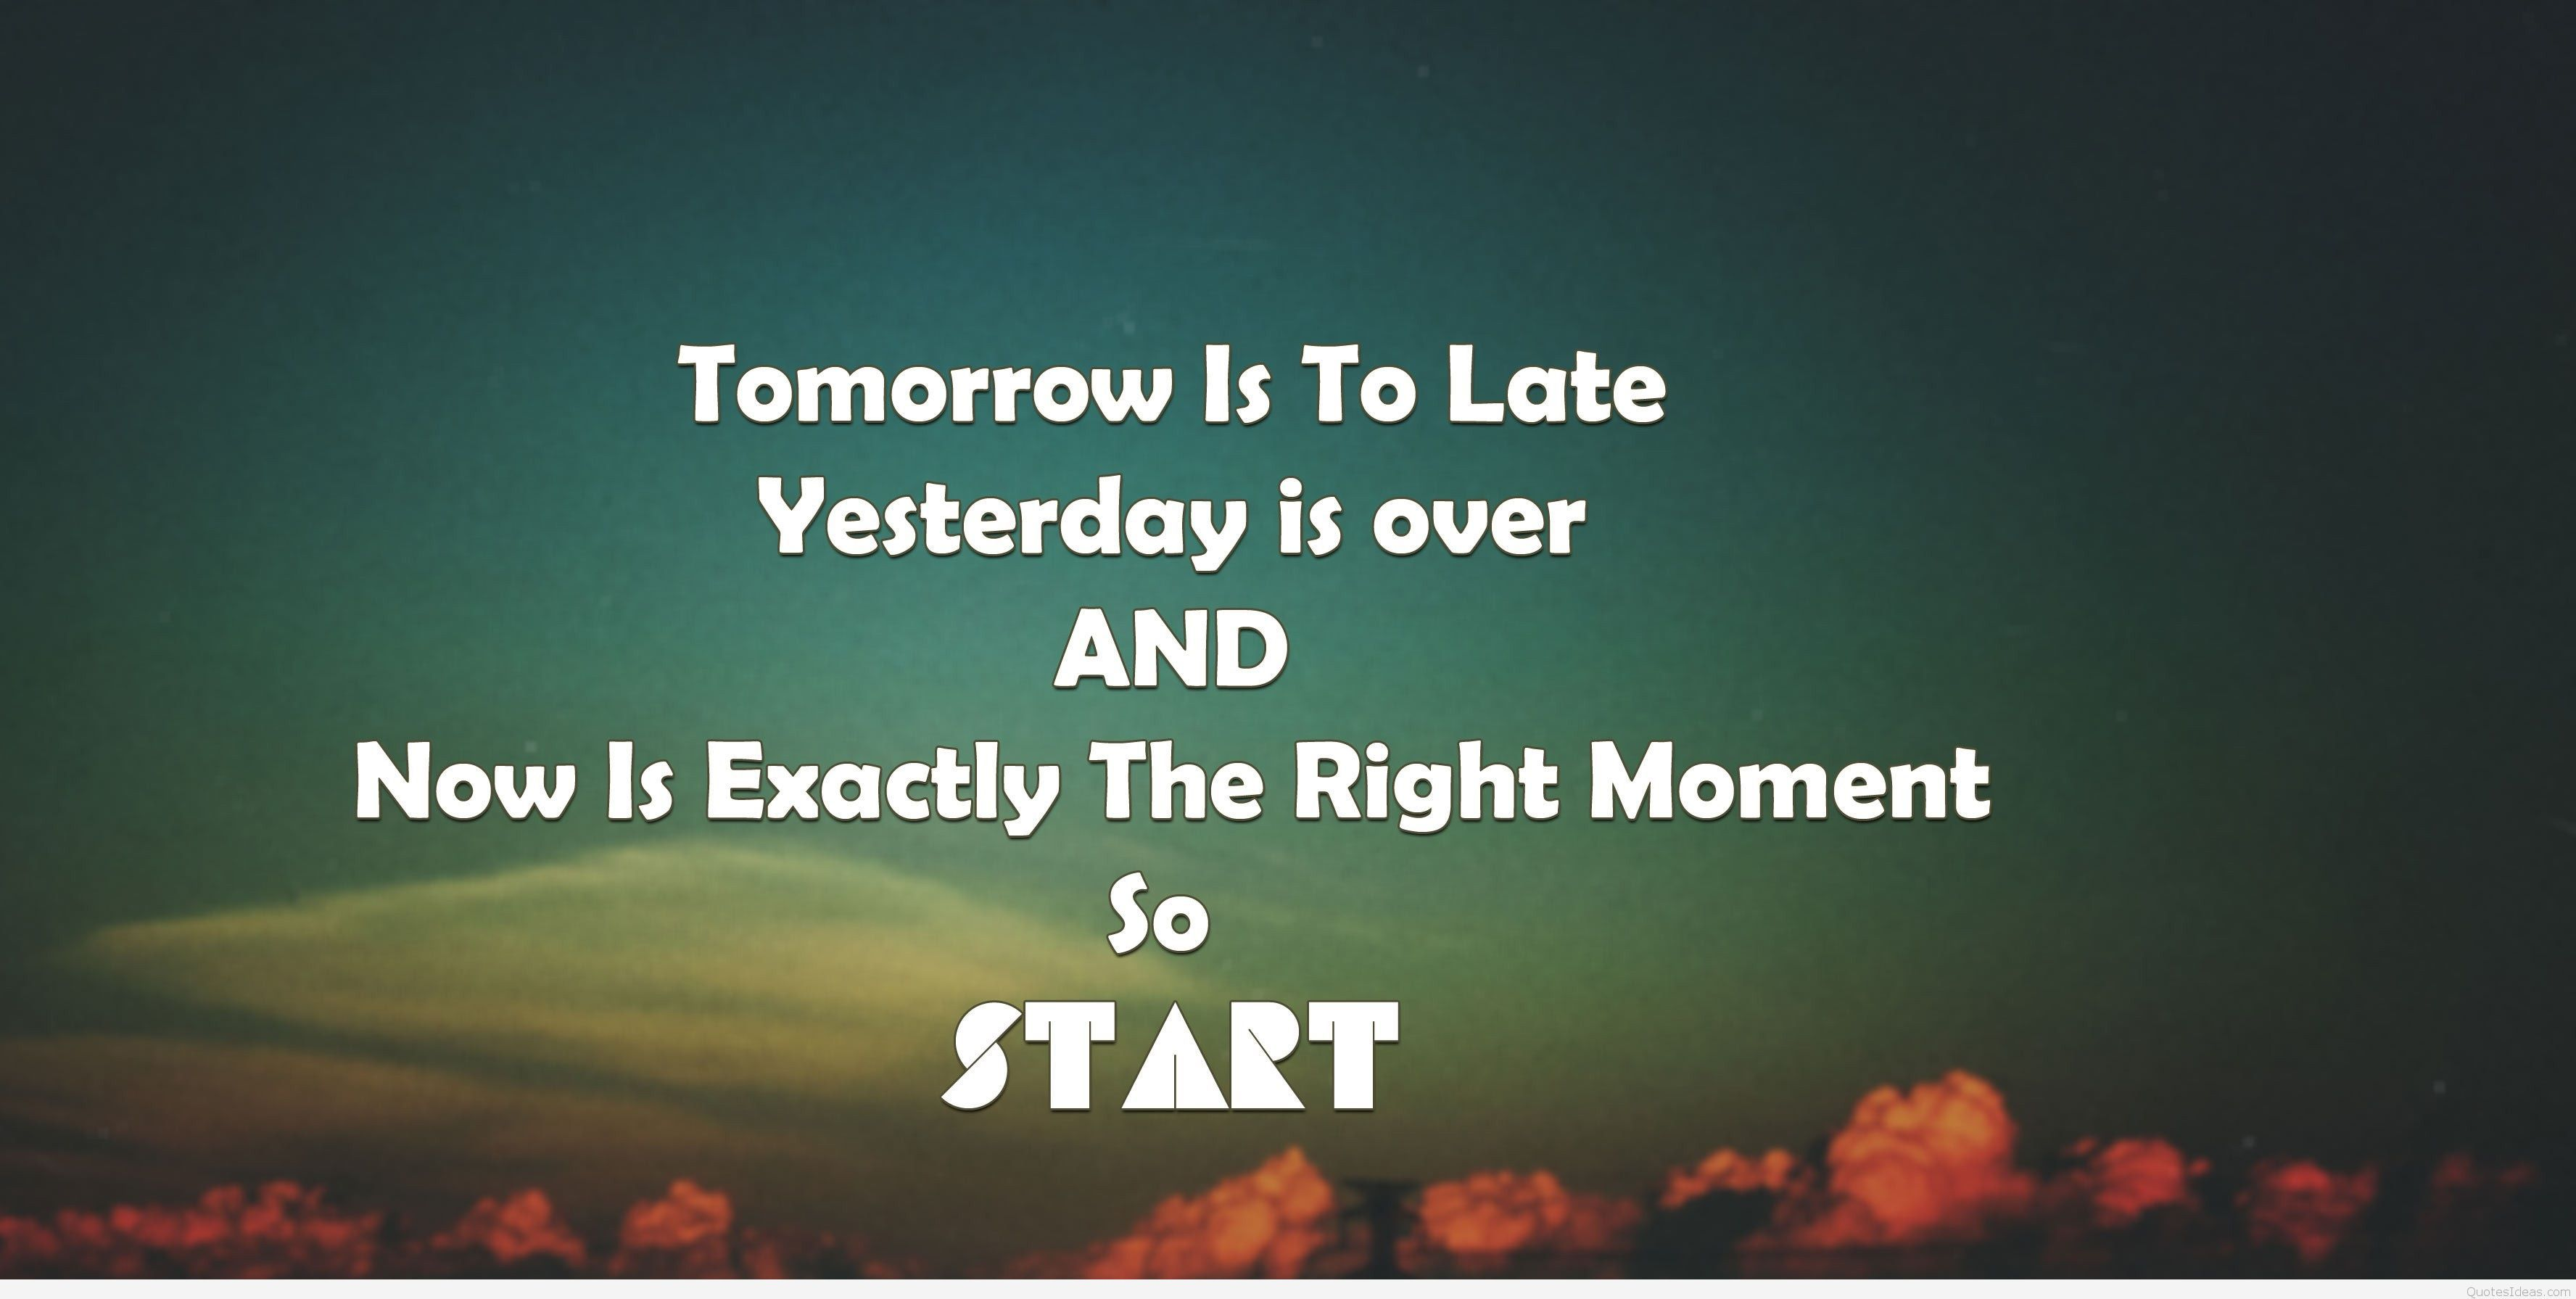 Motivational Quotes English 10 Inspirational Quotesswami Inspirational Quotes About Success Best Motivational Quotes Motivational Quotes